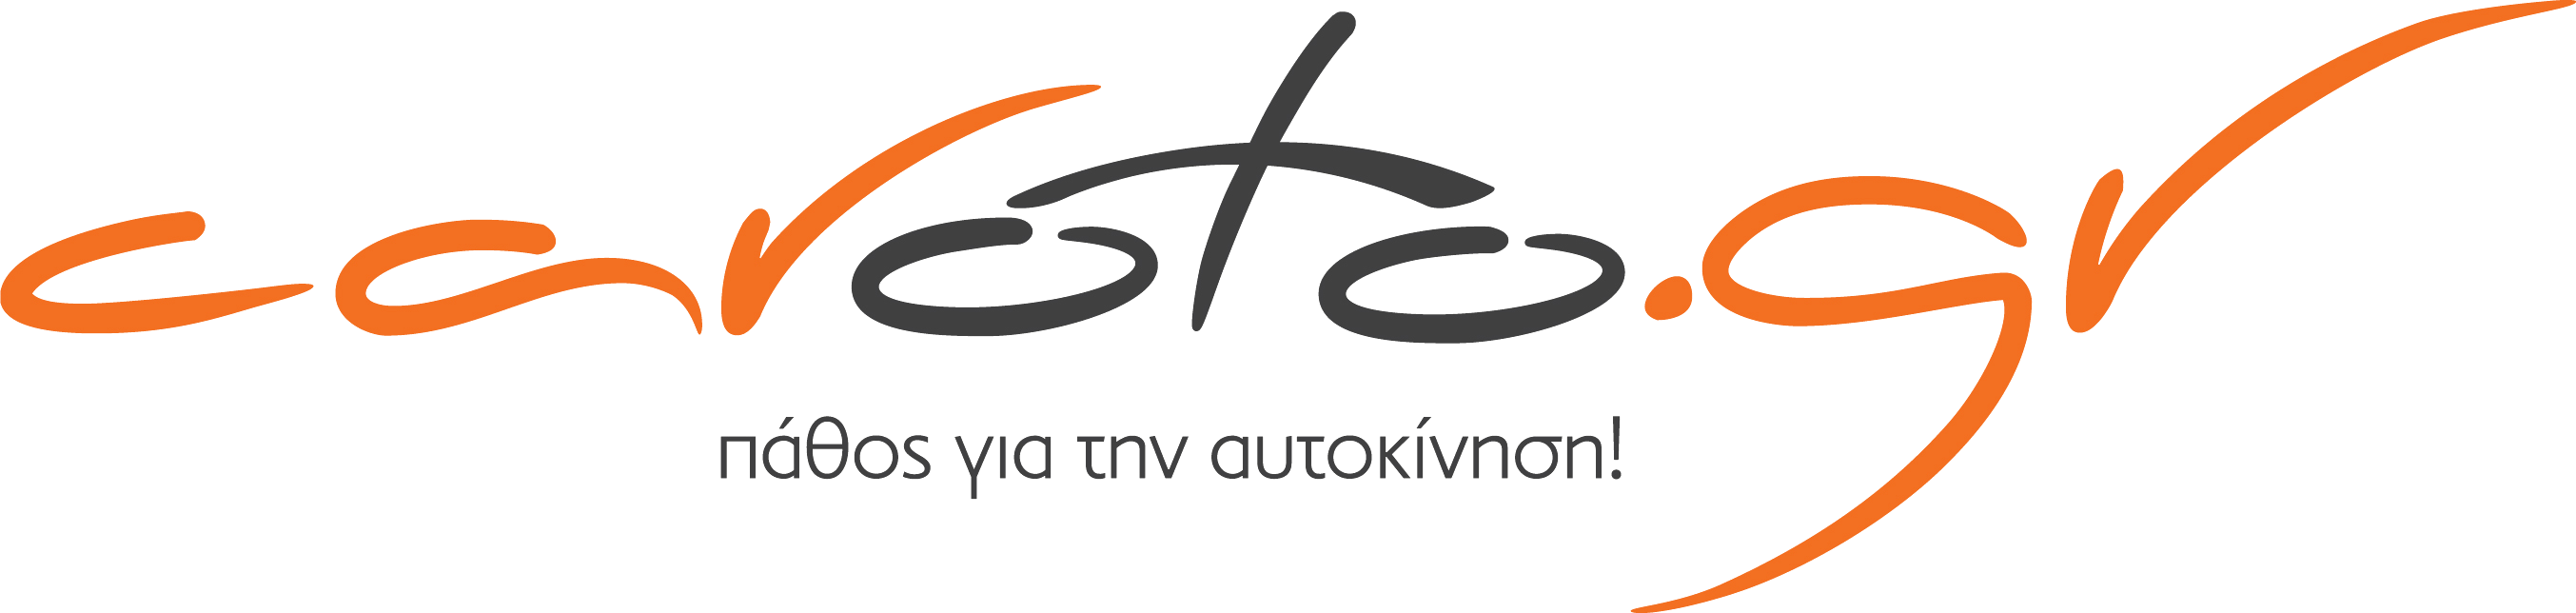 Caroto.gr | Πάθος για την αυτοκίνηση!